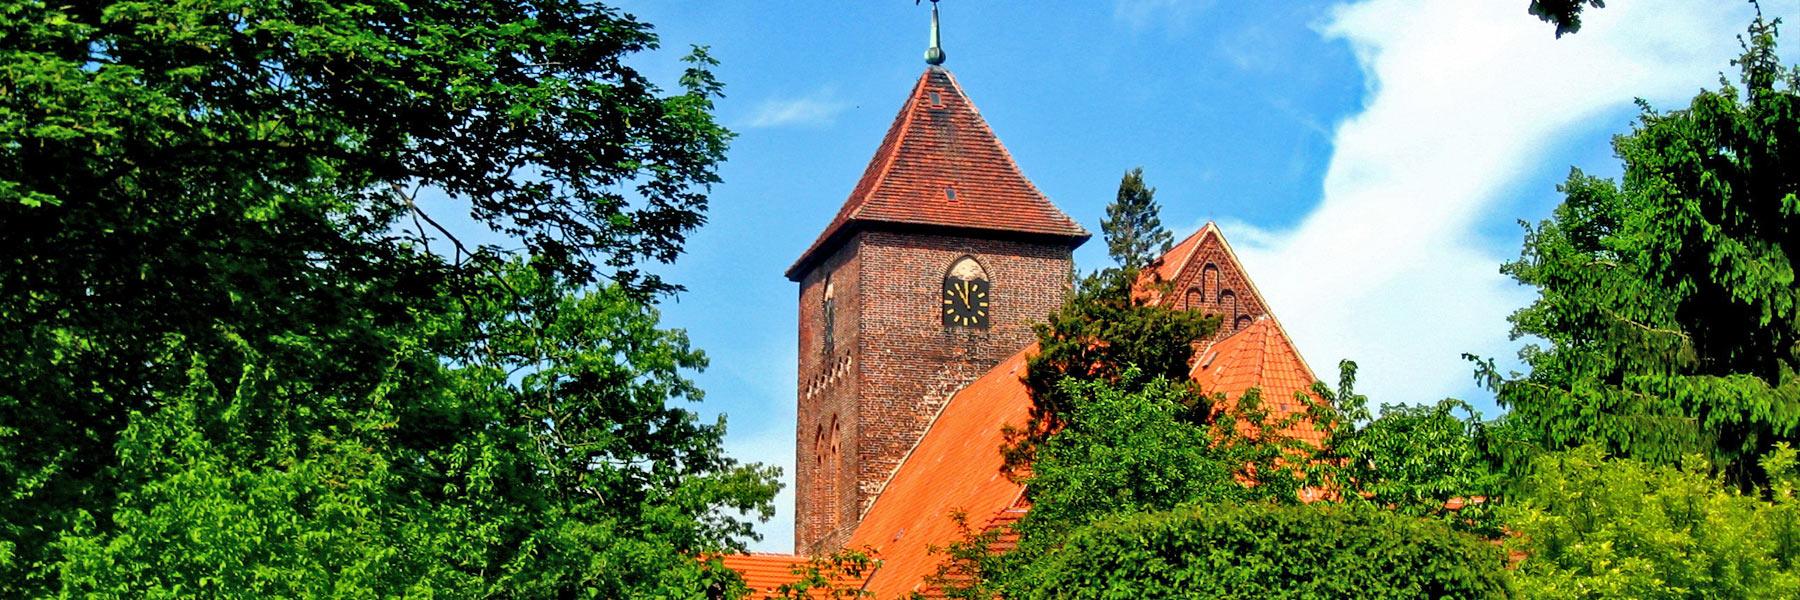 Nikolaikirche - Grevesmühlen